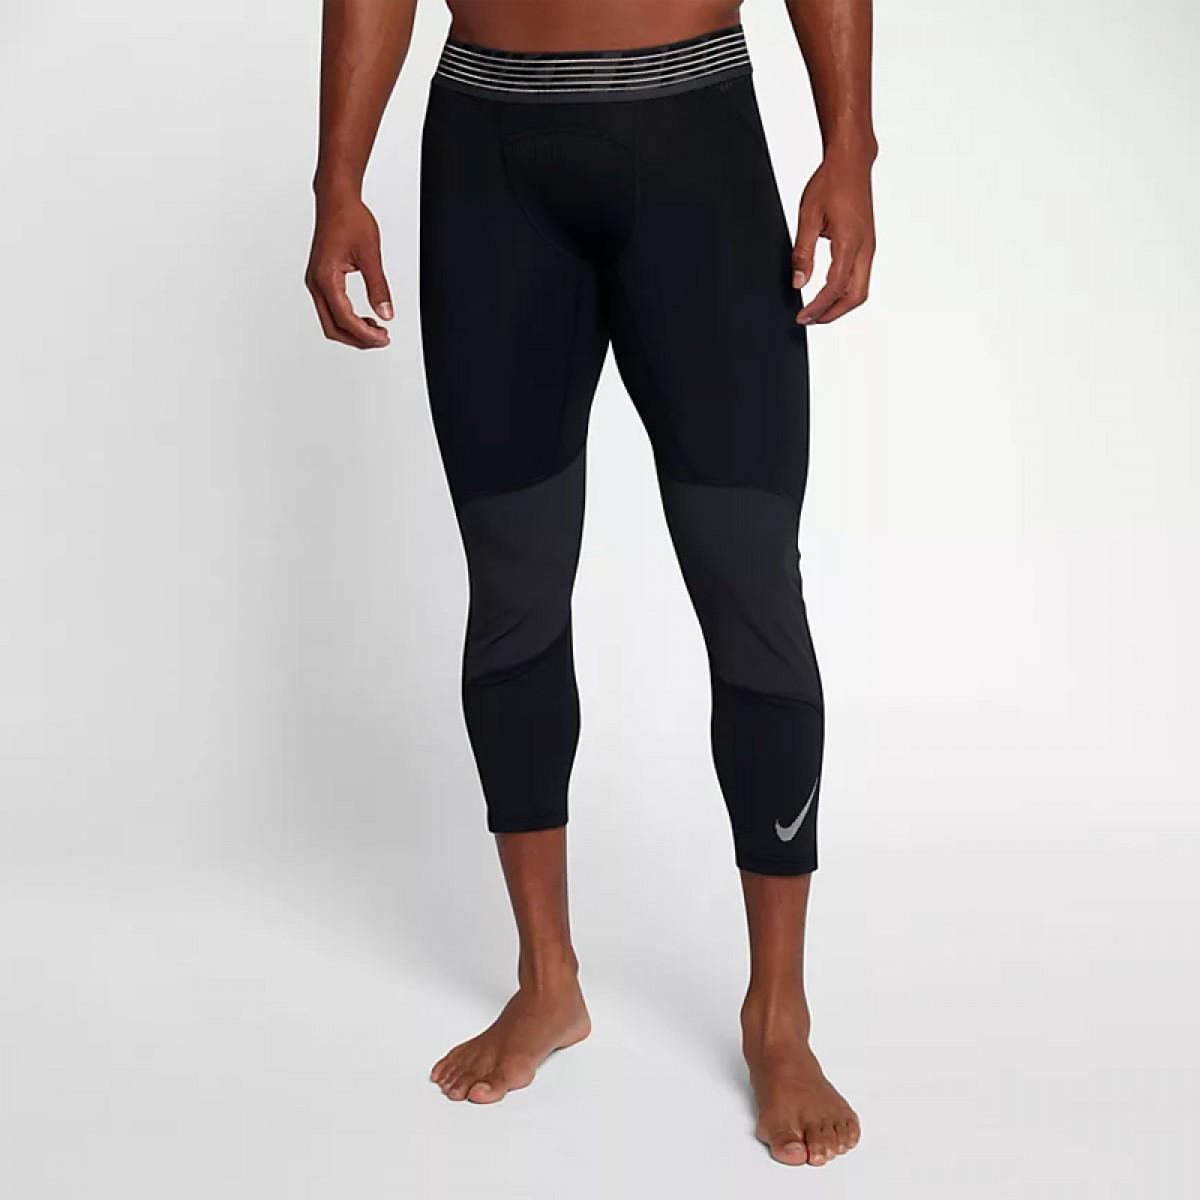 Nike Pro 3/4 Tights 'Black'